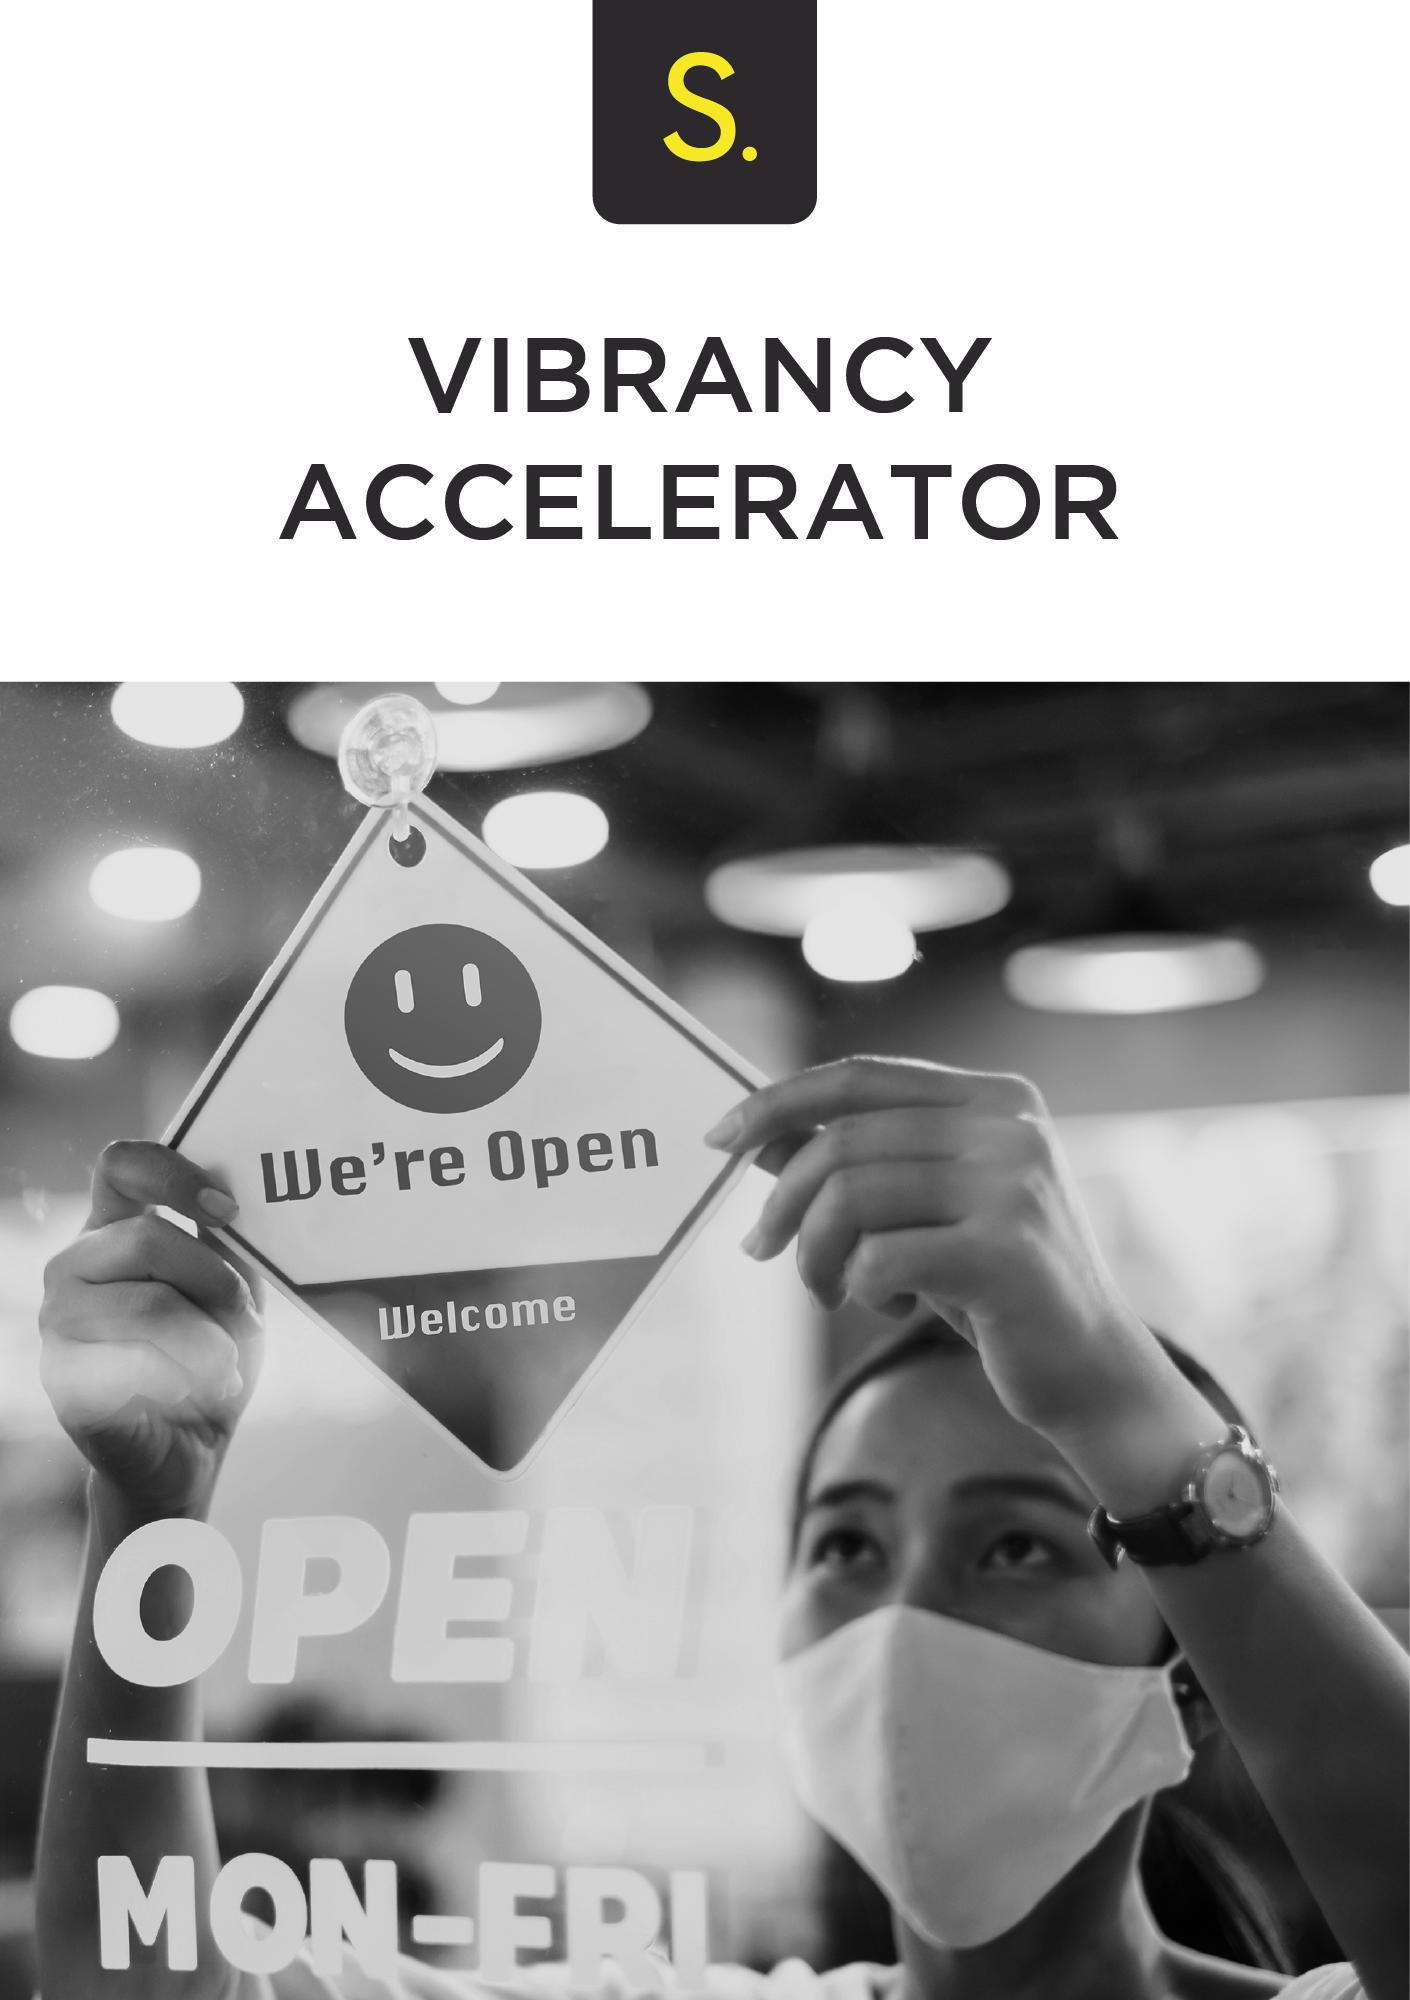 Vibrancy Accelerator